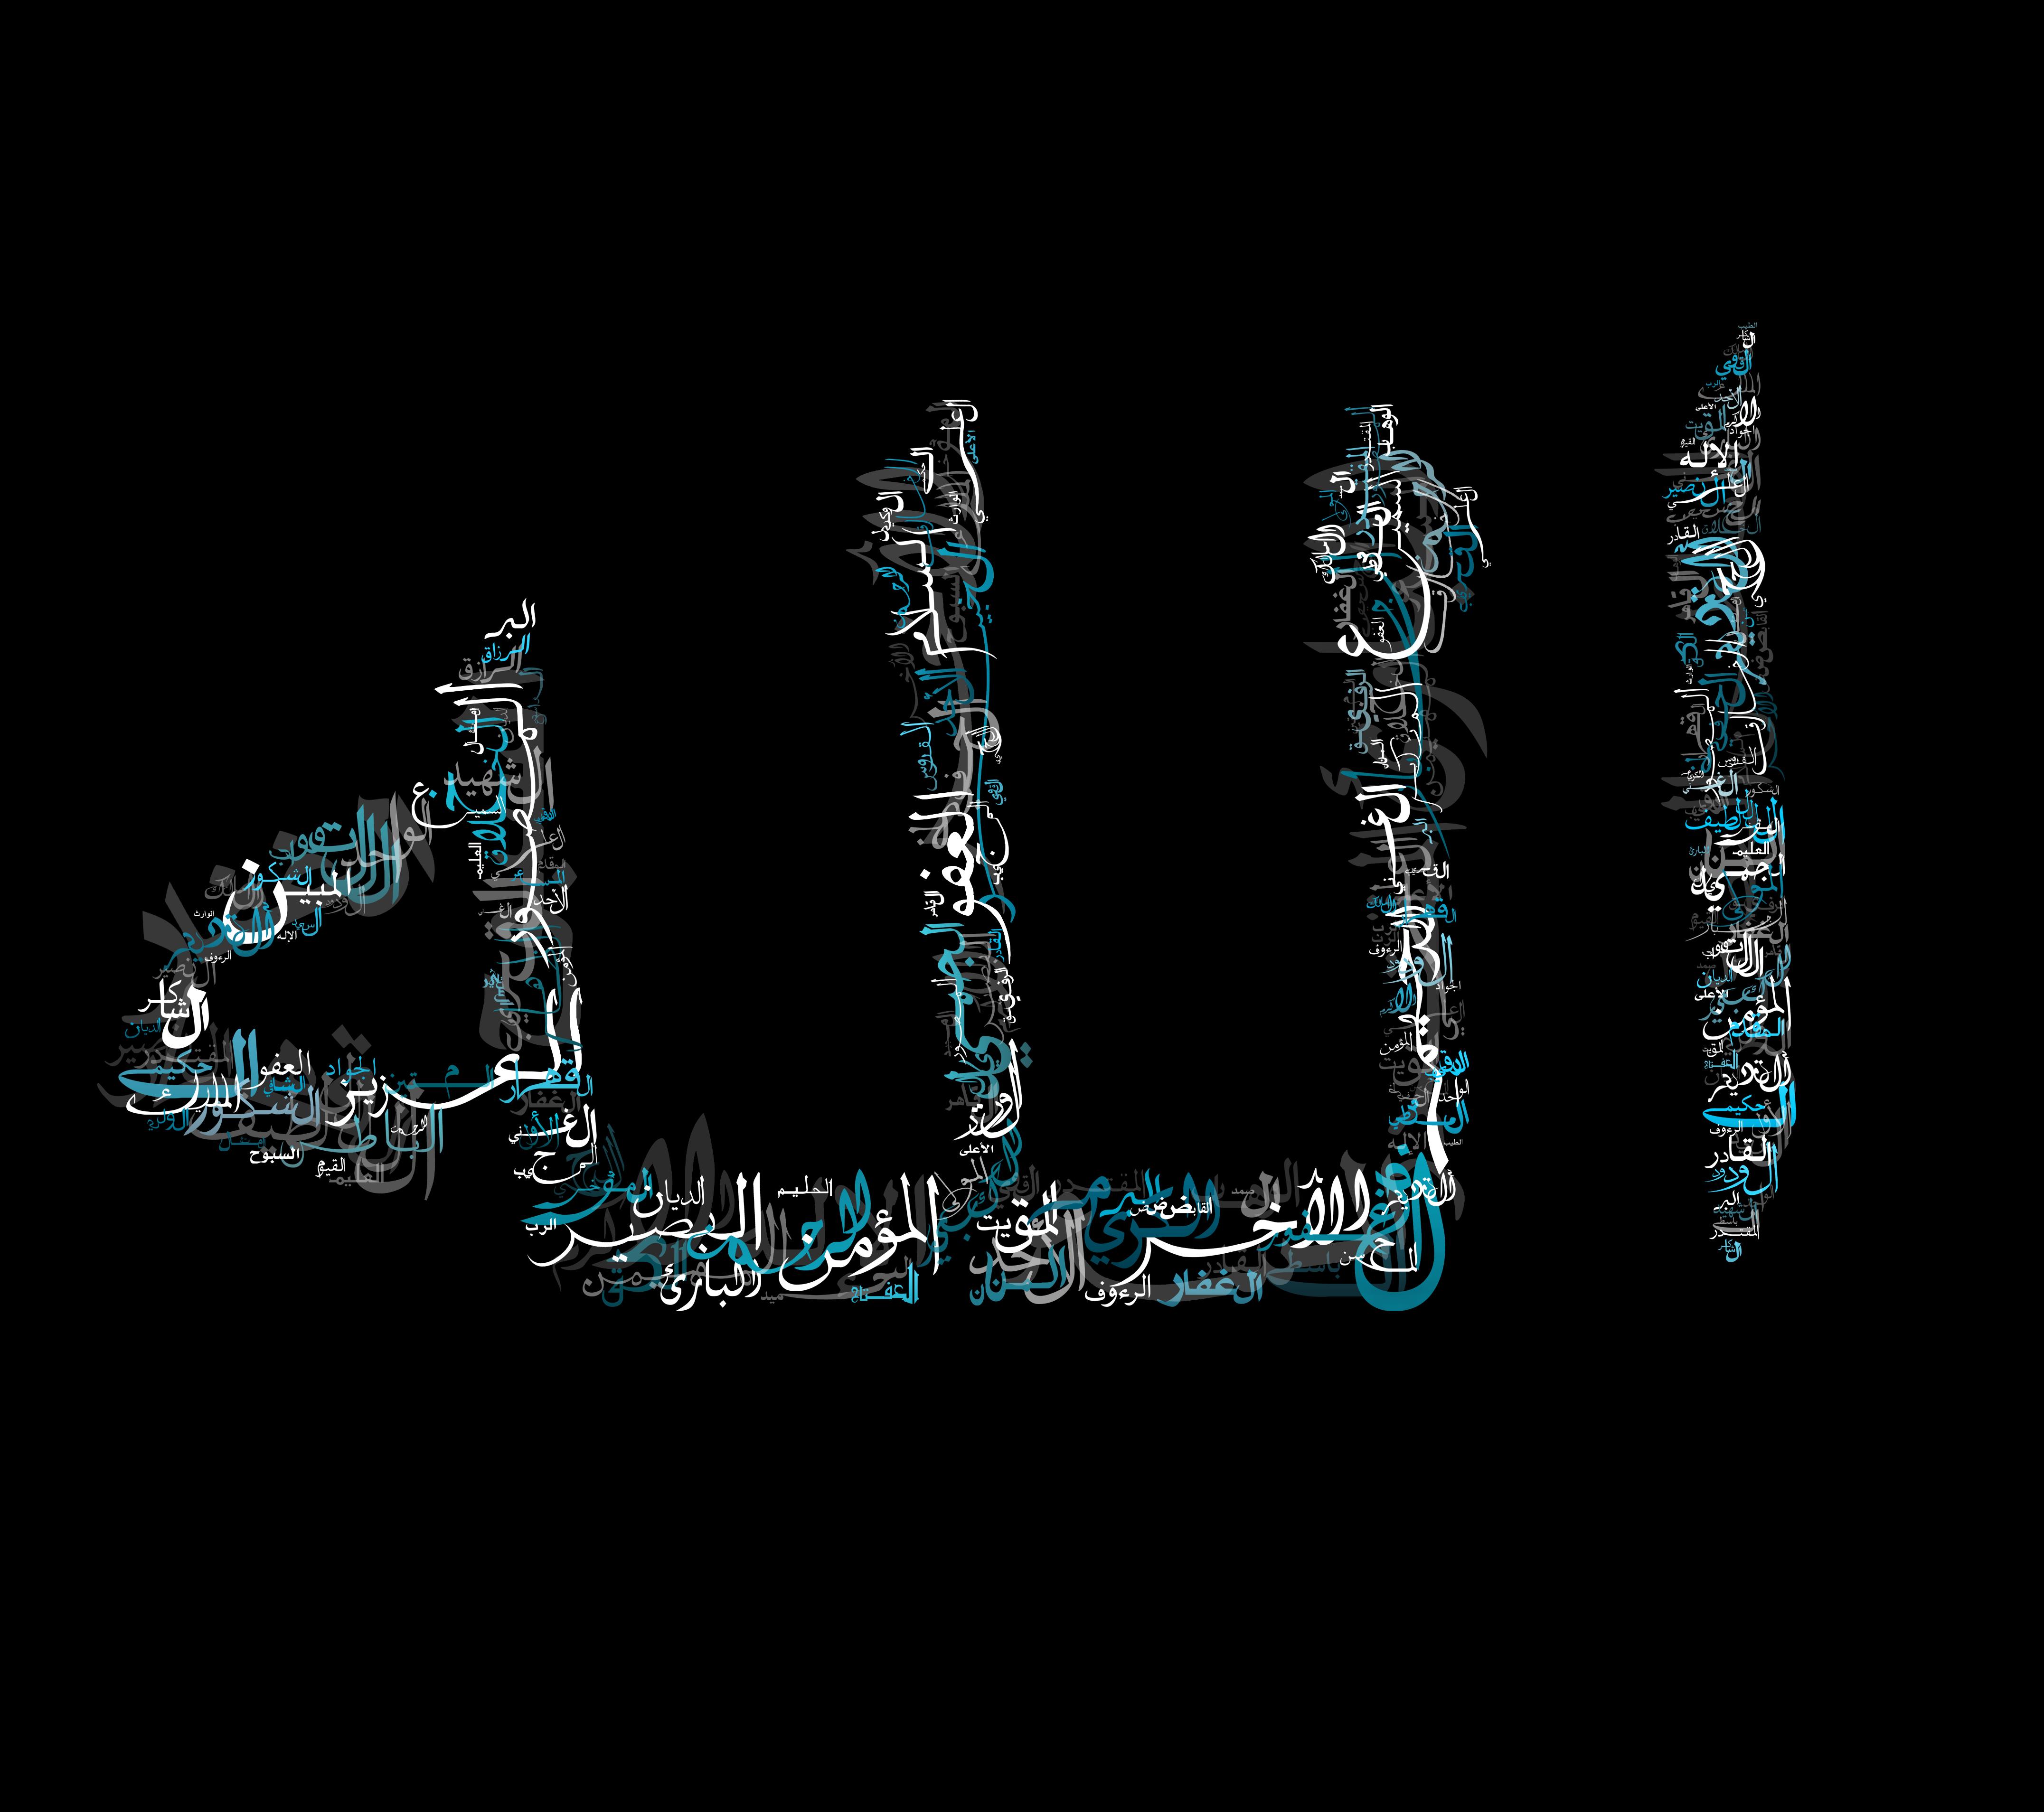 Allah By Saoud Aljedi On Deviantart